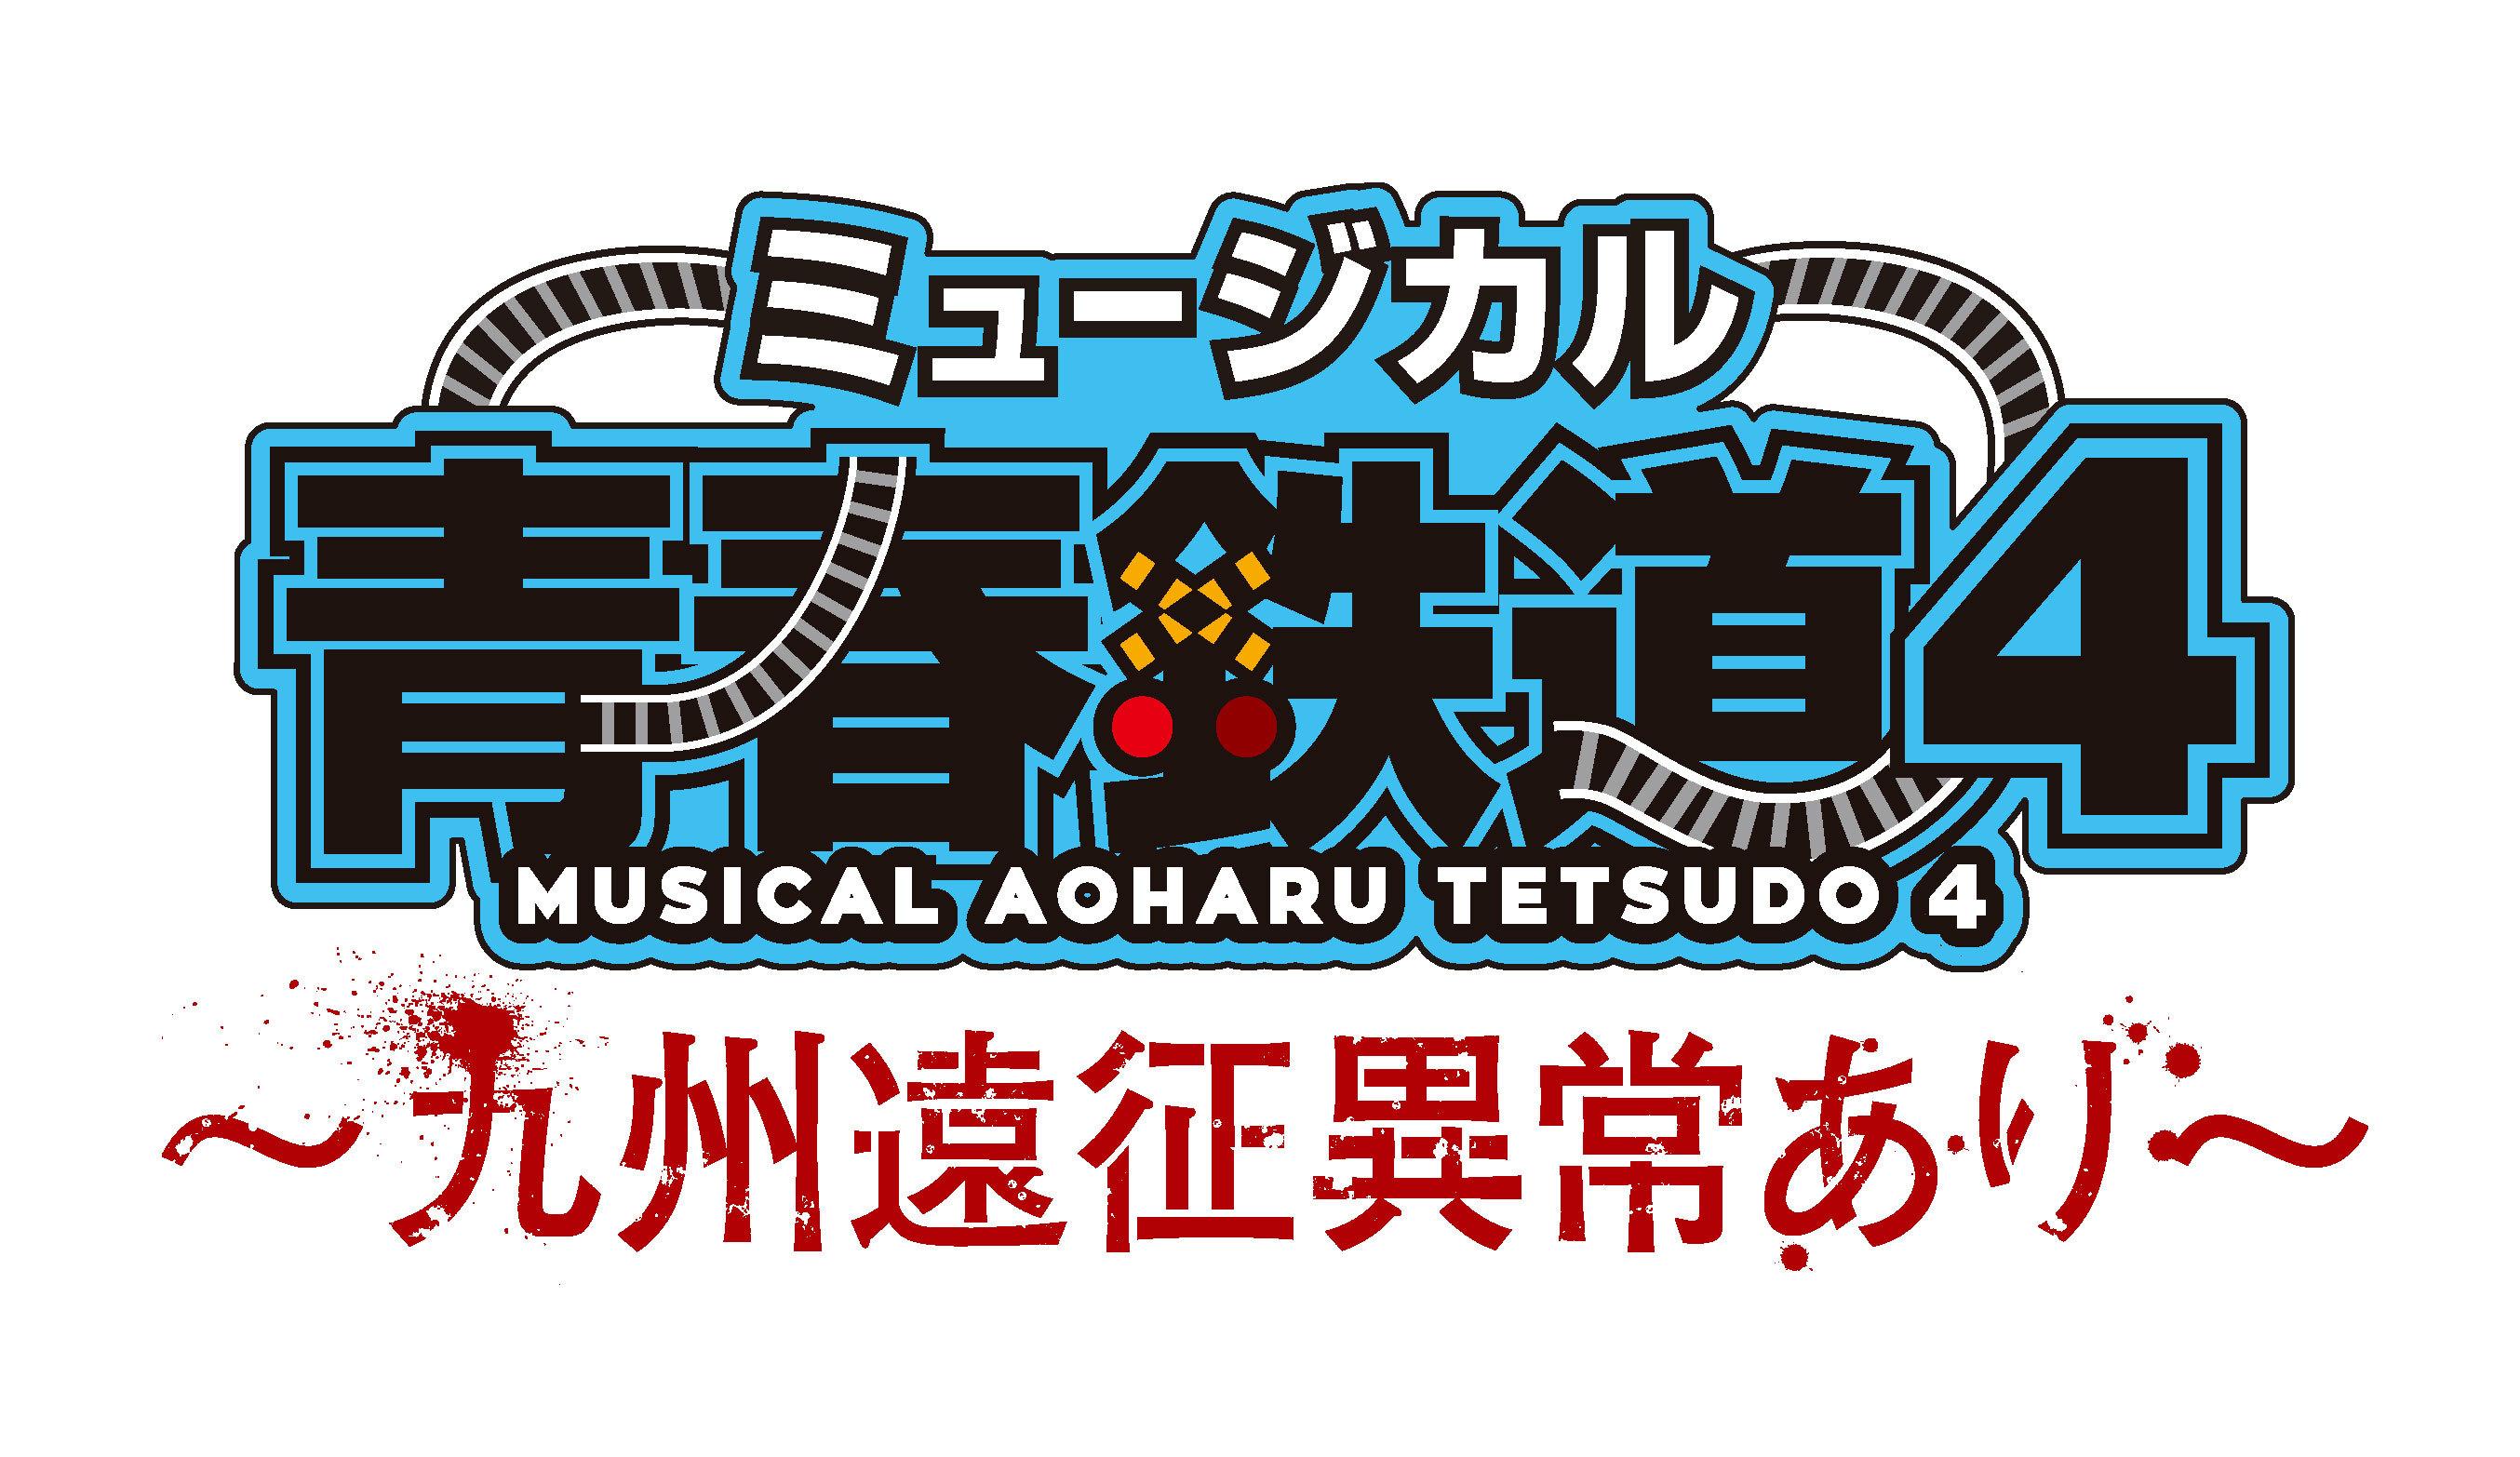 (C)青春 (C)ミュージカル『青春鉄道』製作委員会